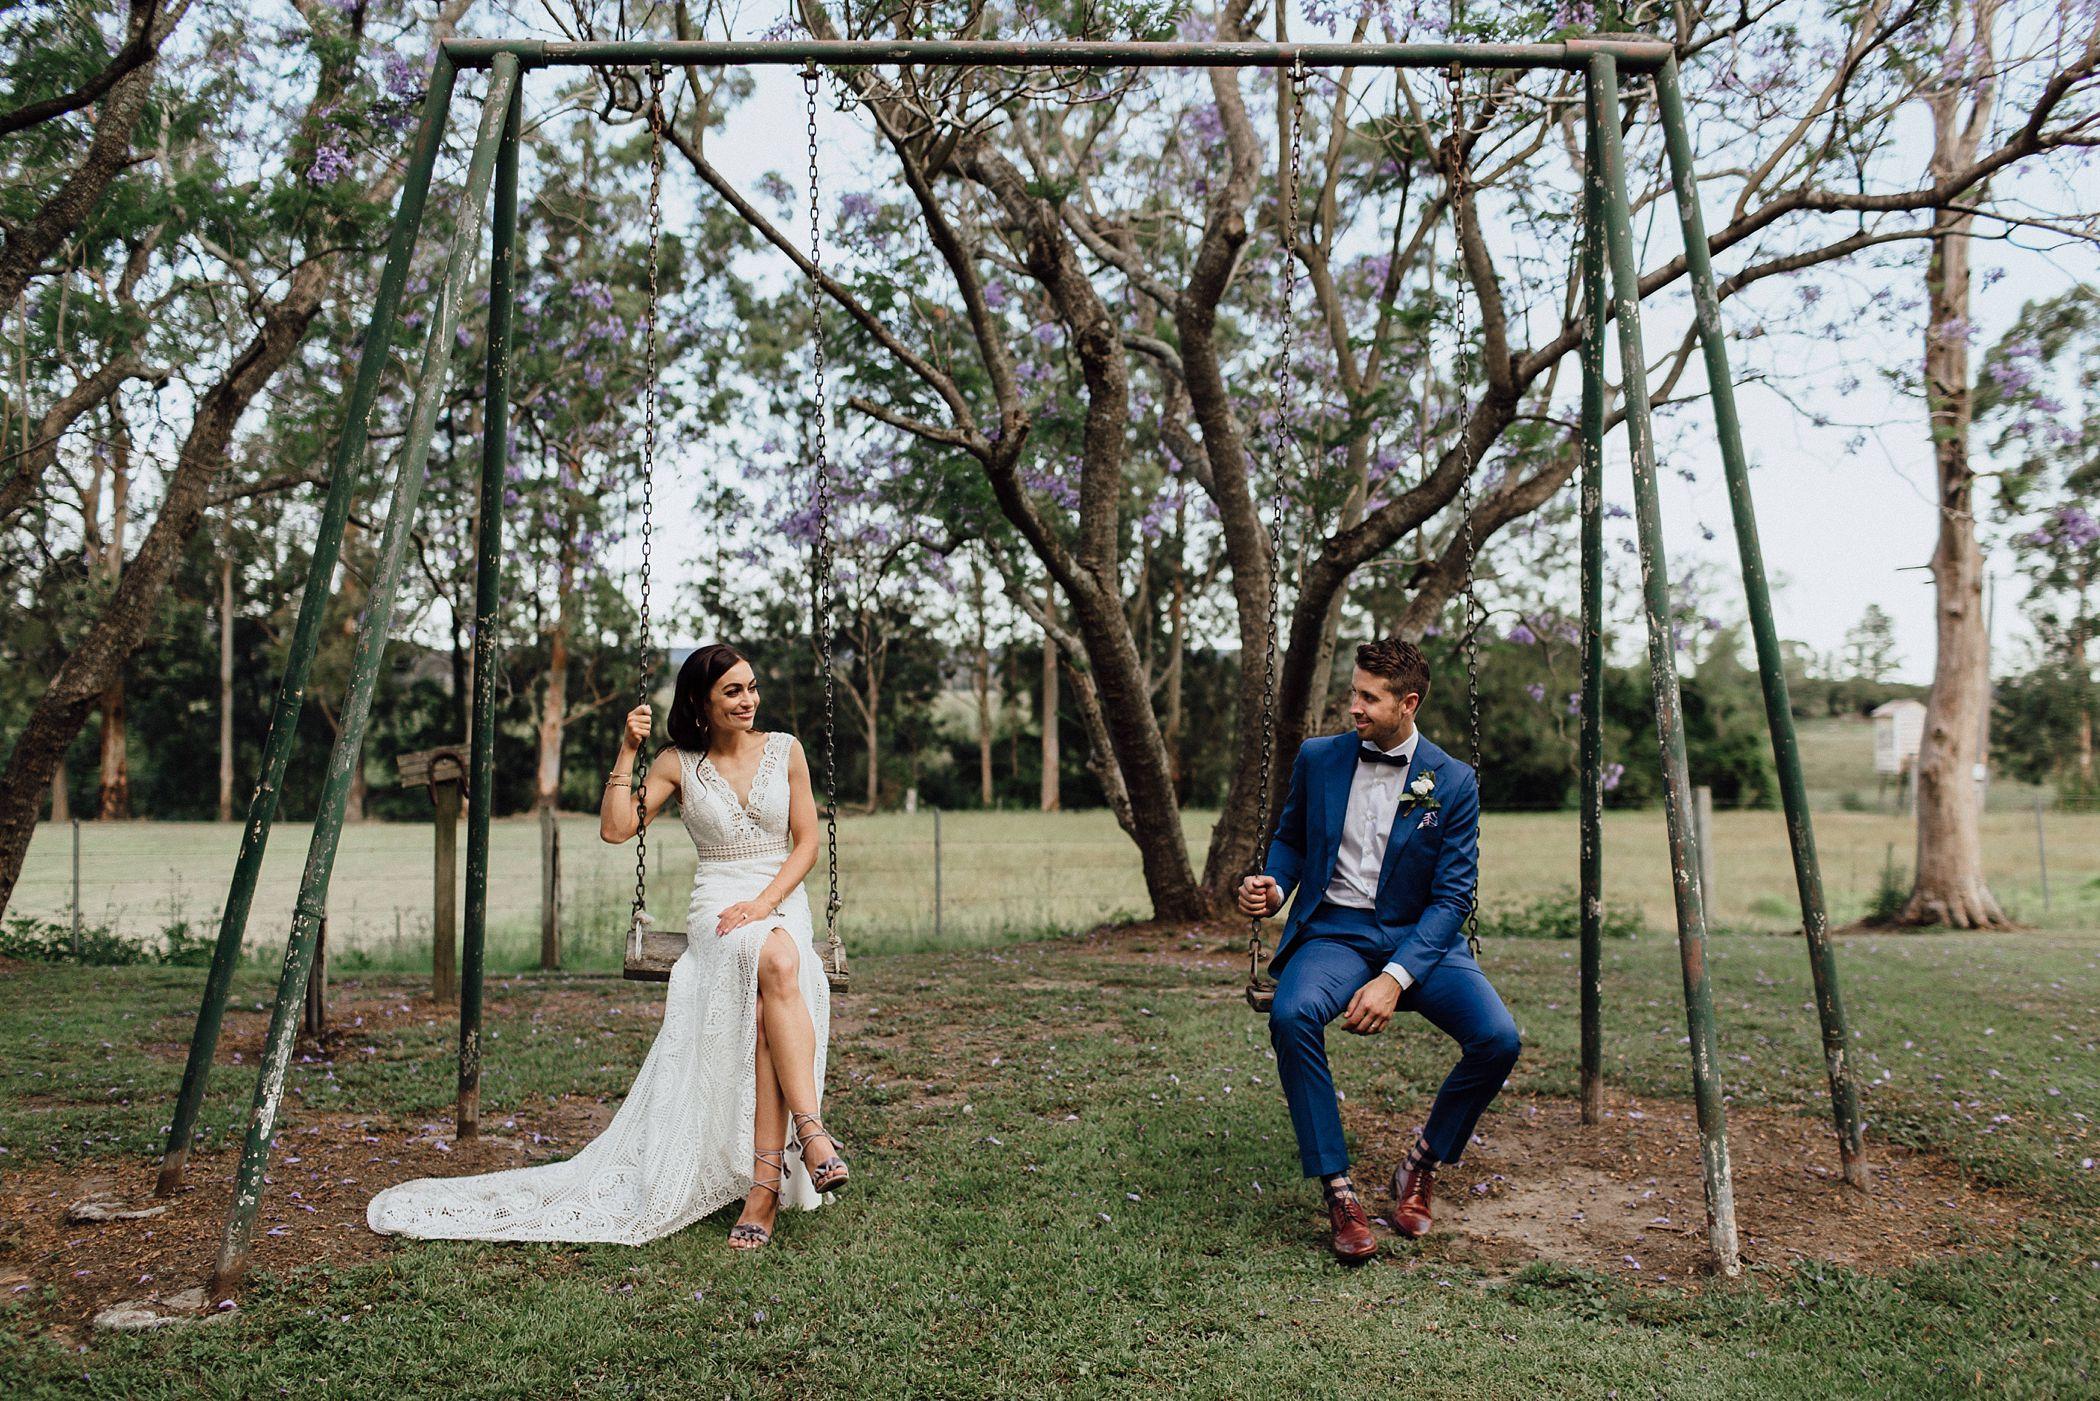 lauren-anne-photography-newcastle-wedding-photographer-mindaribba-house_0085.jpg